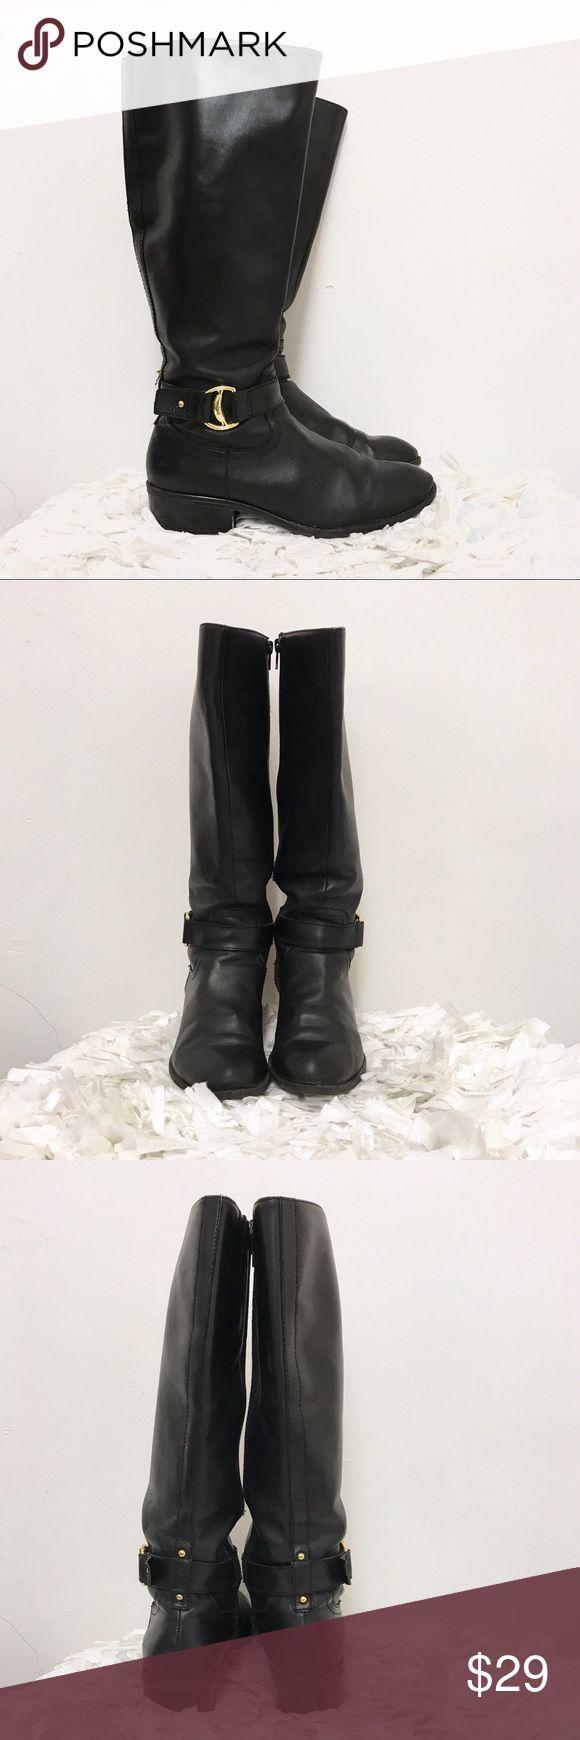 Ralph Lauren Micah boots sz 7 black leather Ralph Lauren boots. Sz 7. Overall good condition. Heels show some wear as pictured. Ralph Lauren  Shoes